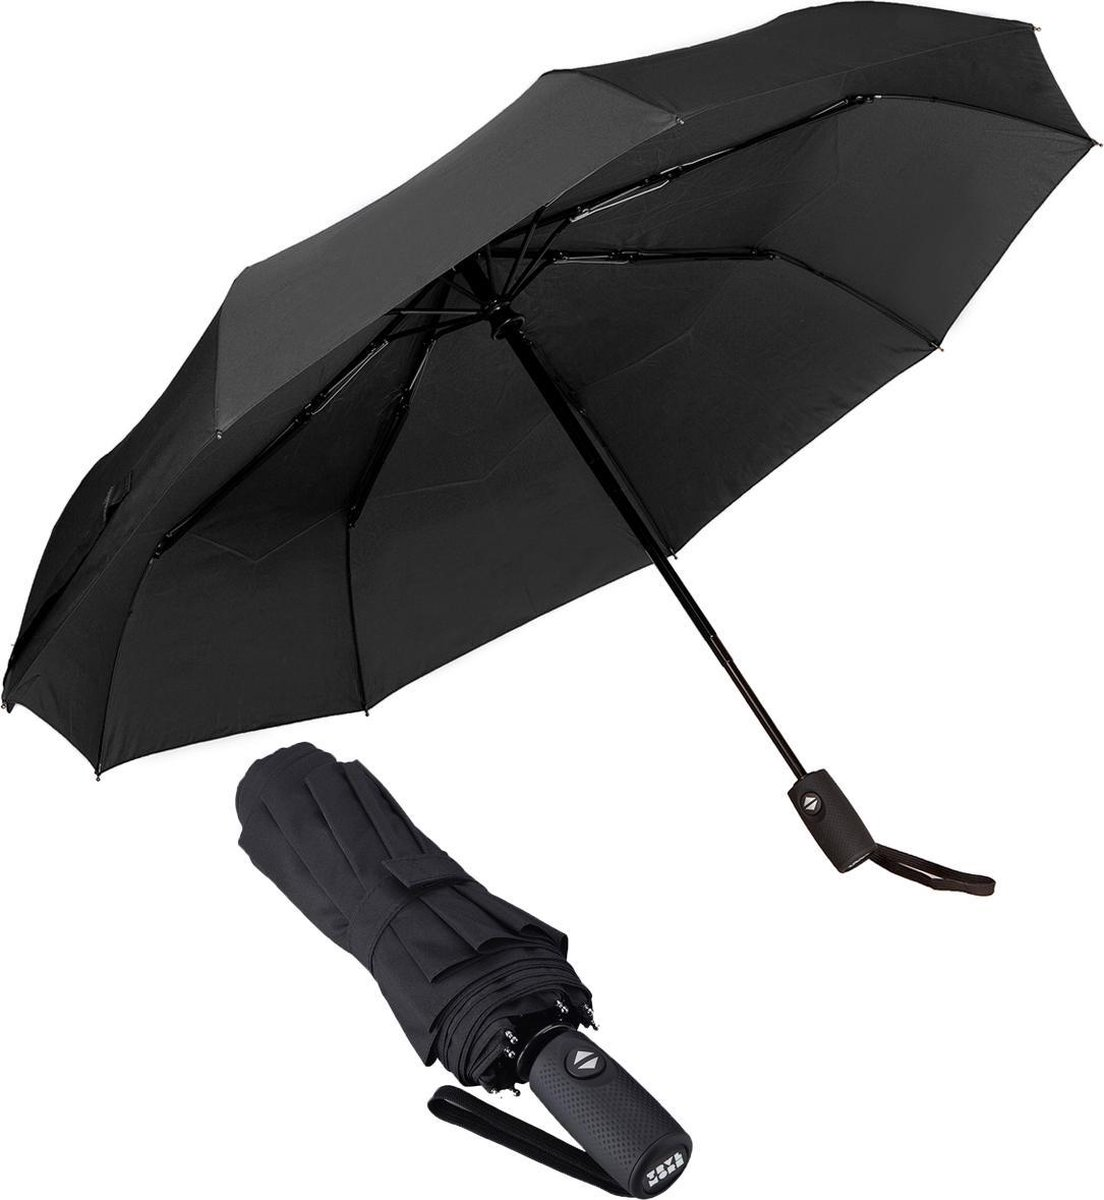 TravelMore Automatische Stormparaplu – Opvouwbaar & Windproof tot 100km p/u - Ø 107 cm - Zwart